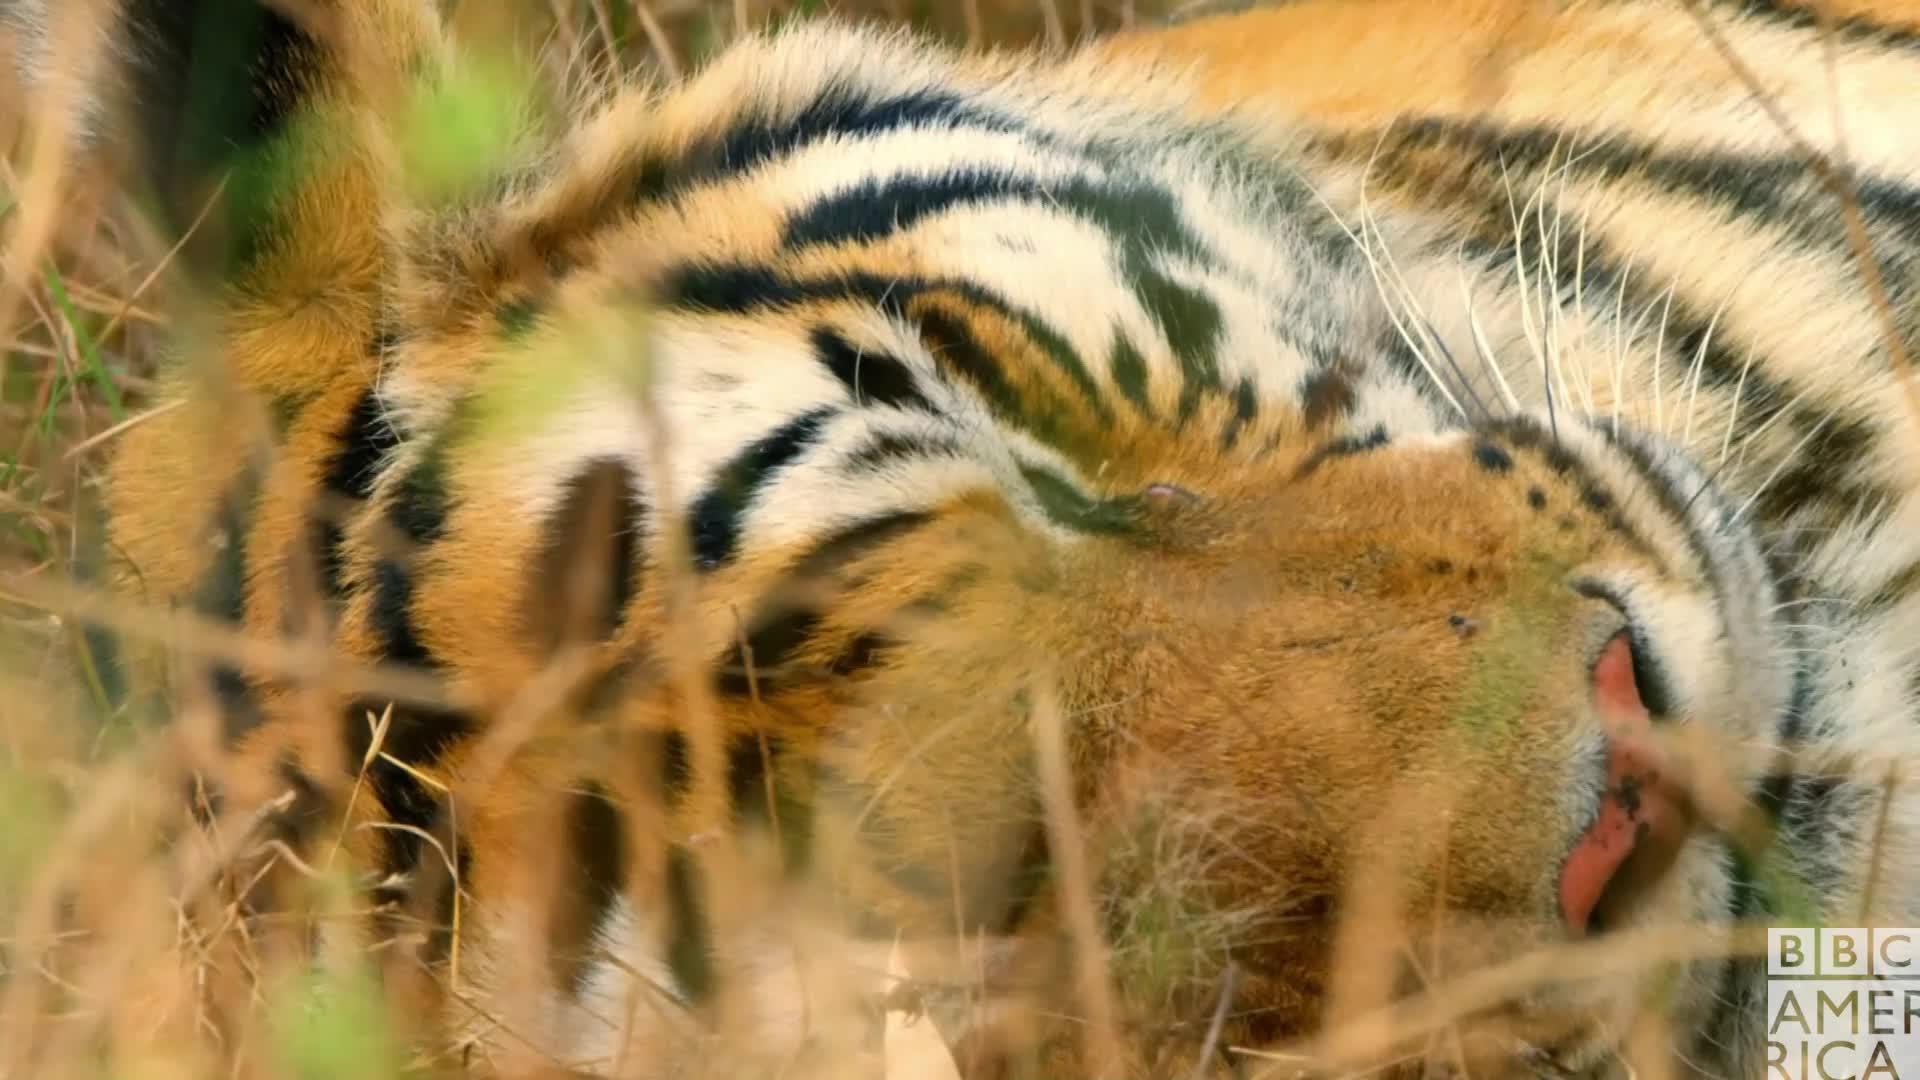 animal, animals, bbc america, bbc america dynasties, bbc america: dynasties, dynasties, sleep, sleepy, tiger, tigers, tired, zzz, Dynasties Raj Bhera Tiger Sleeping GIFs